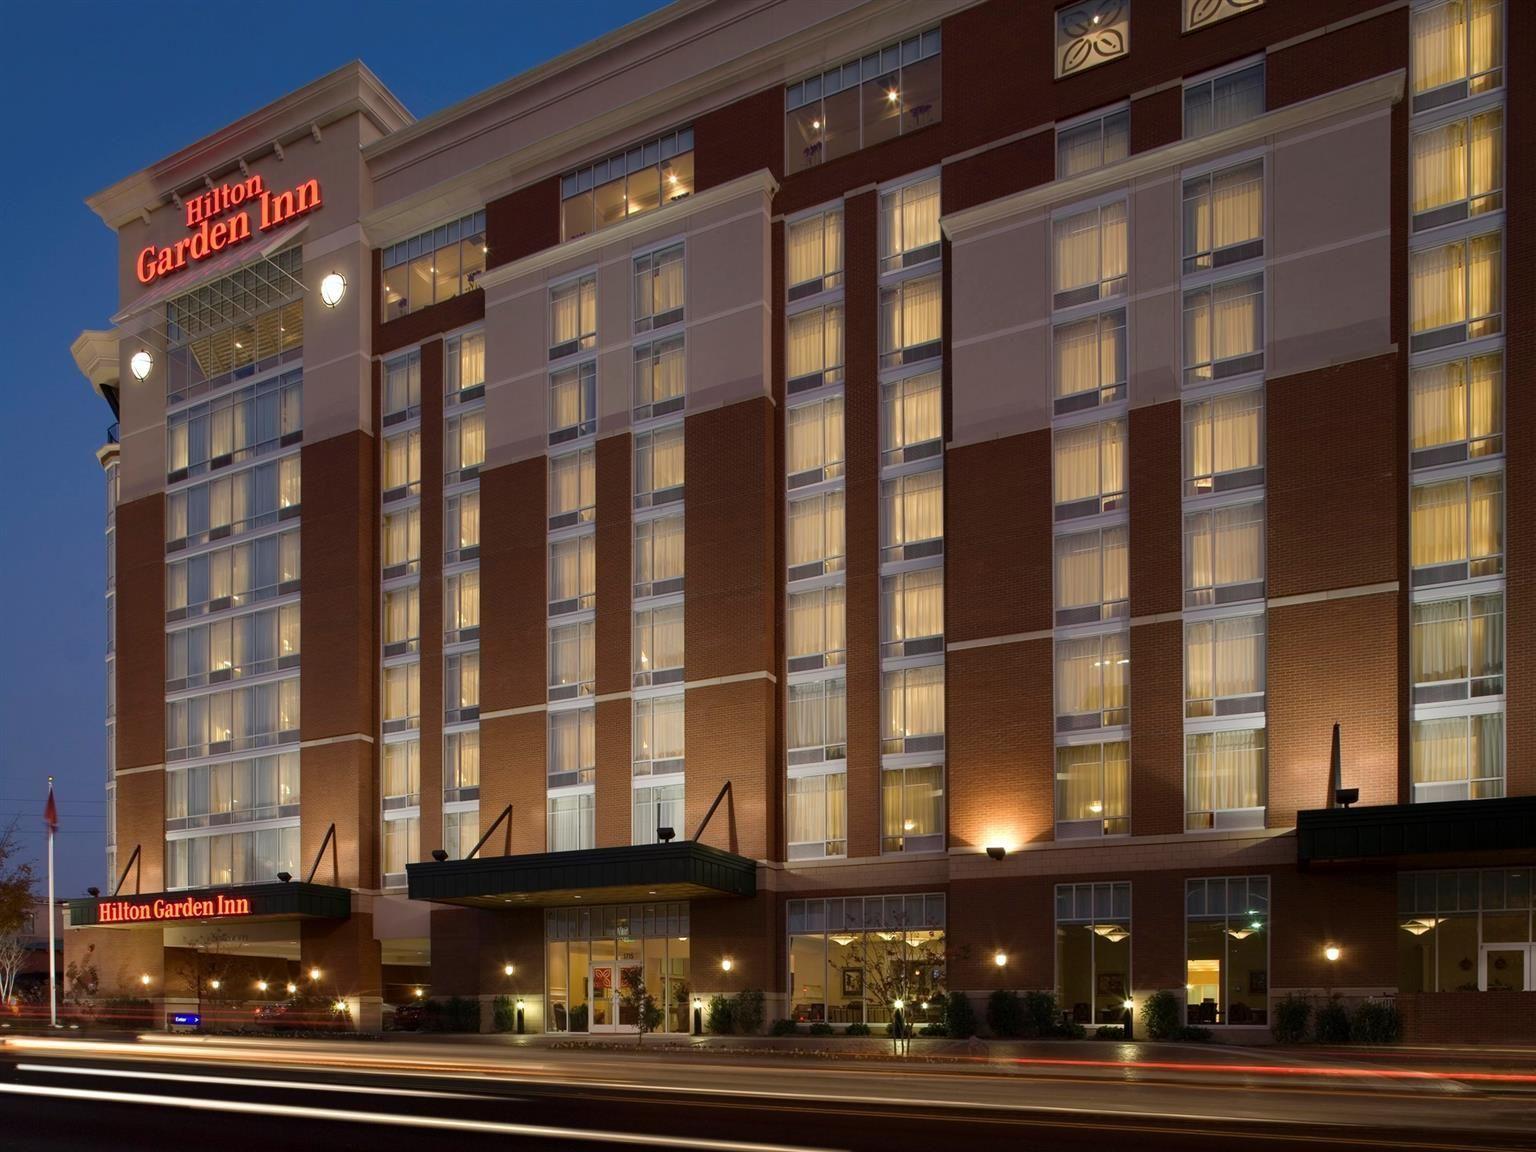 Nashville (TN) Hilton Garden Inn Nashville Vanderbilt